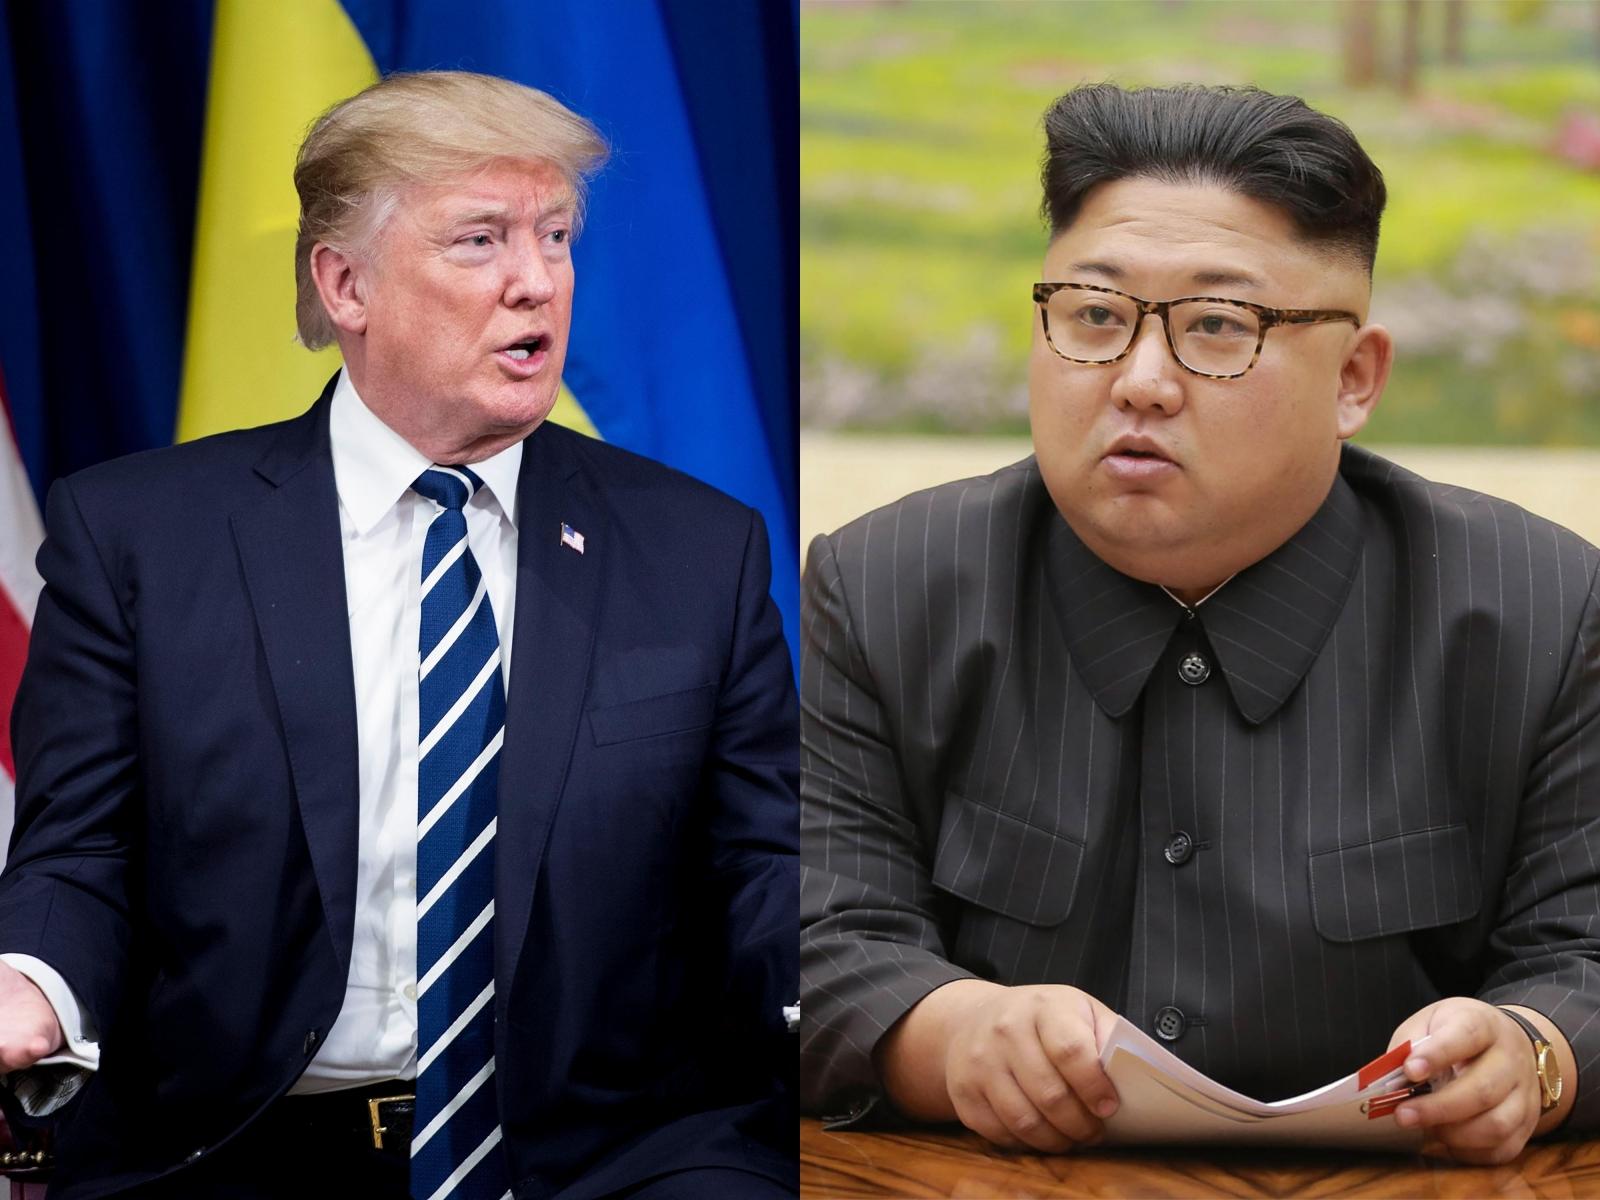 donald-trump-warns-north-korea-of-devastating-consequences-if-u-s-uses-military-option